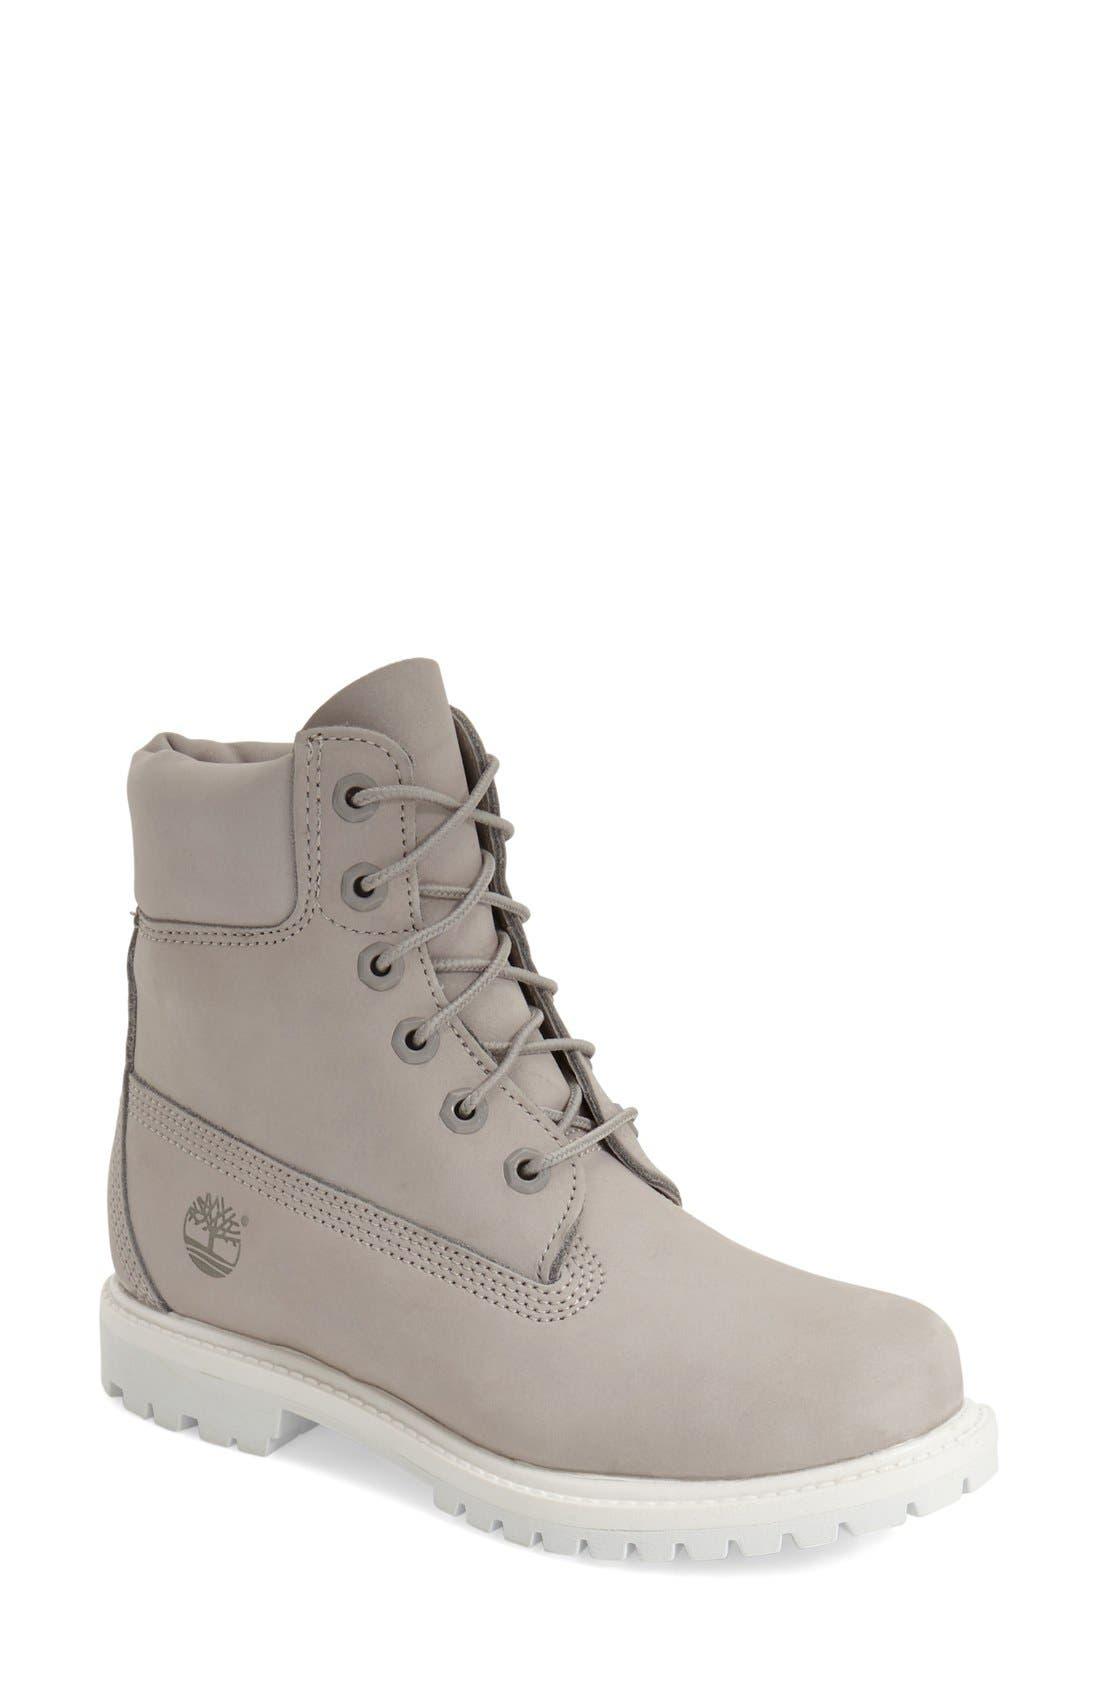 Alternate Image 1 Selected - Timberland '6 Inch Premium' Waterproof Boot (Women)